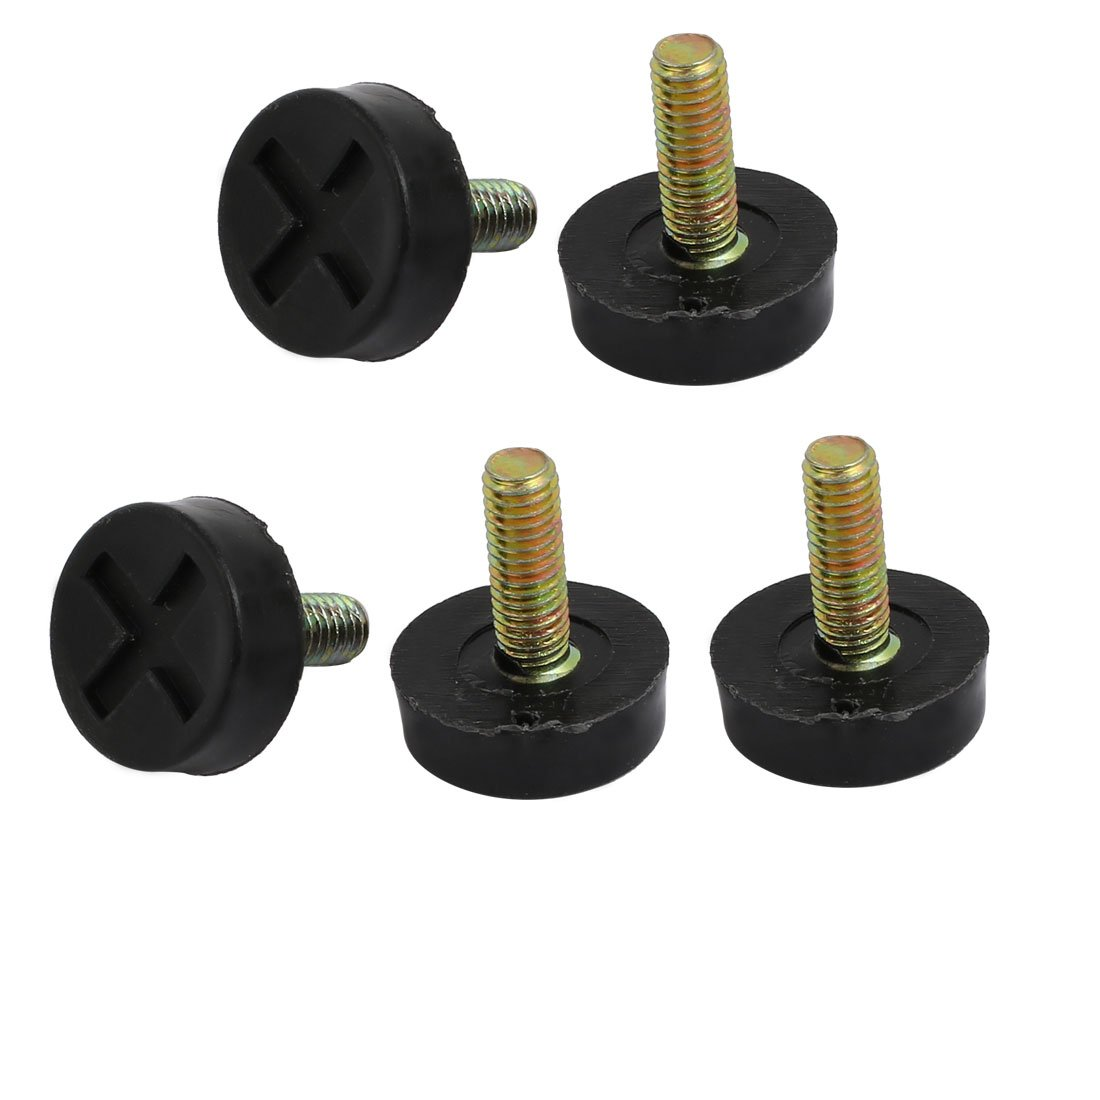 uxcell 5pcs M6x17mm Threaded 22mm Dia Plastic Base Adjustable Leveling Foot Black